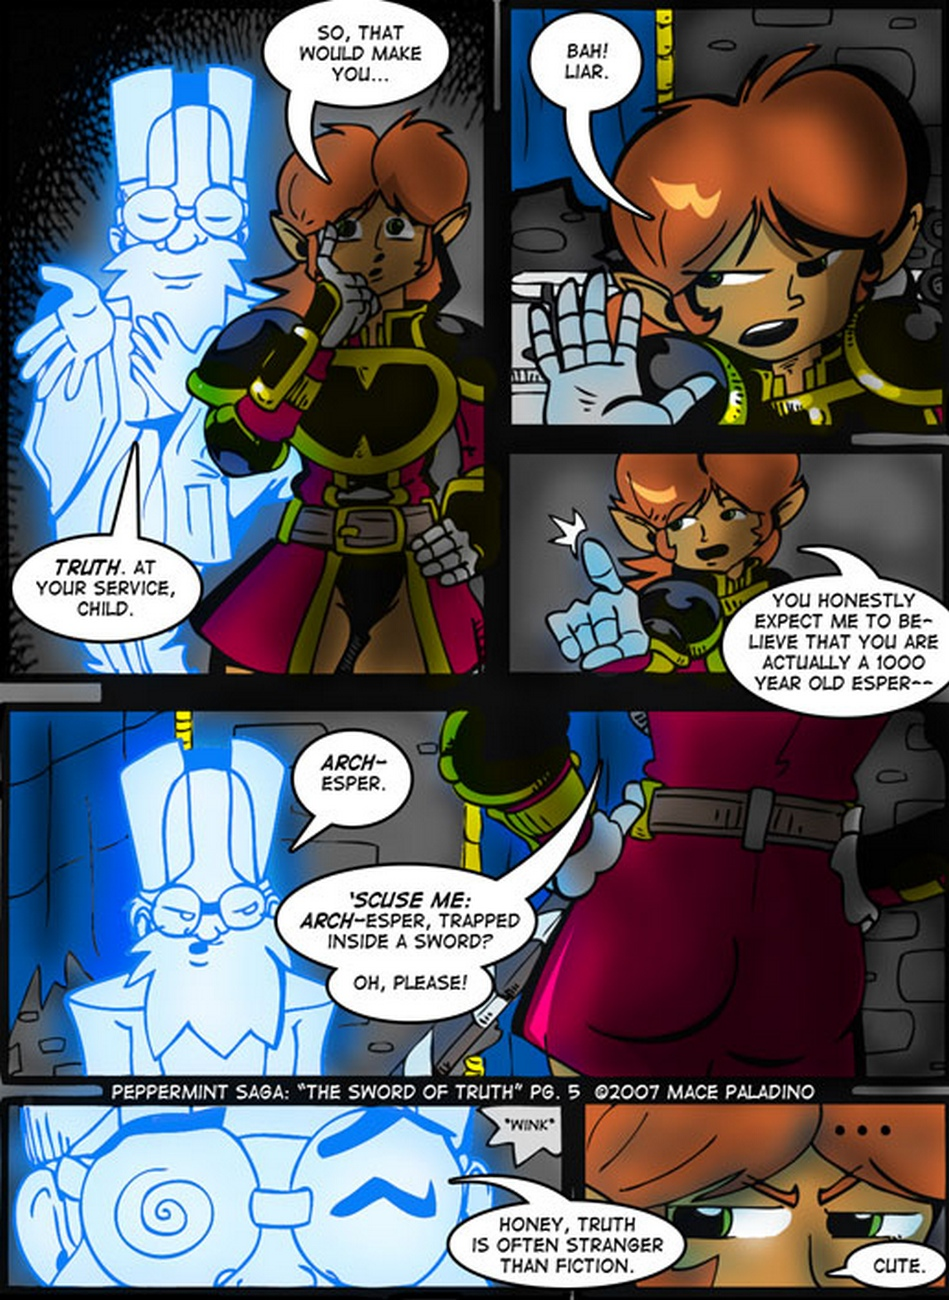 Peppermint-Saga-1-The-Sword-Of-Truth 7 free sex comic